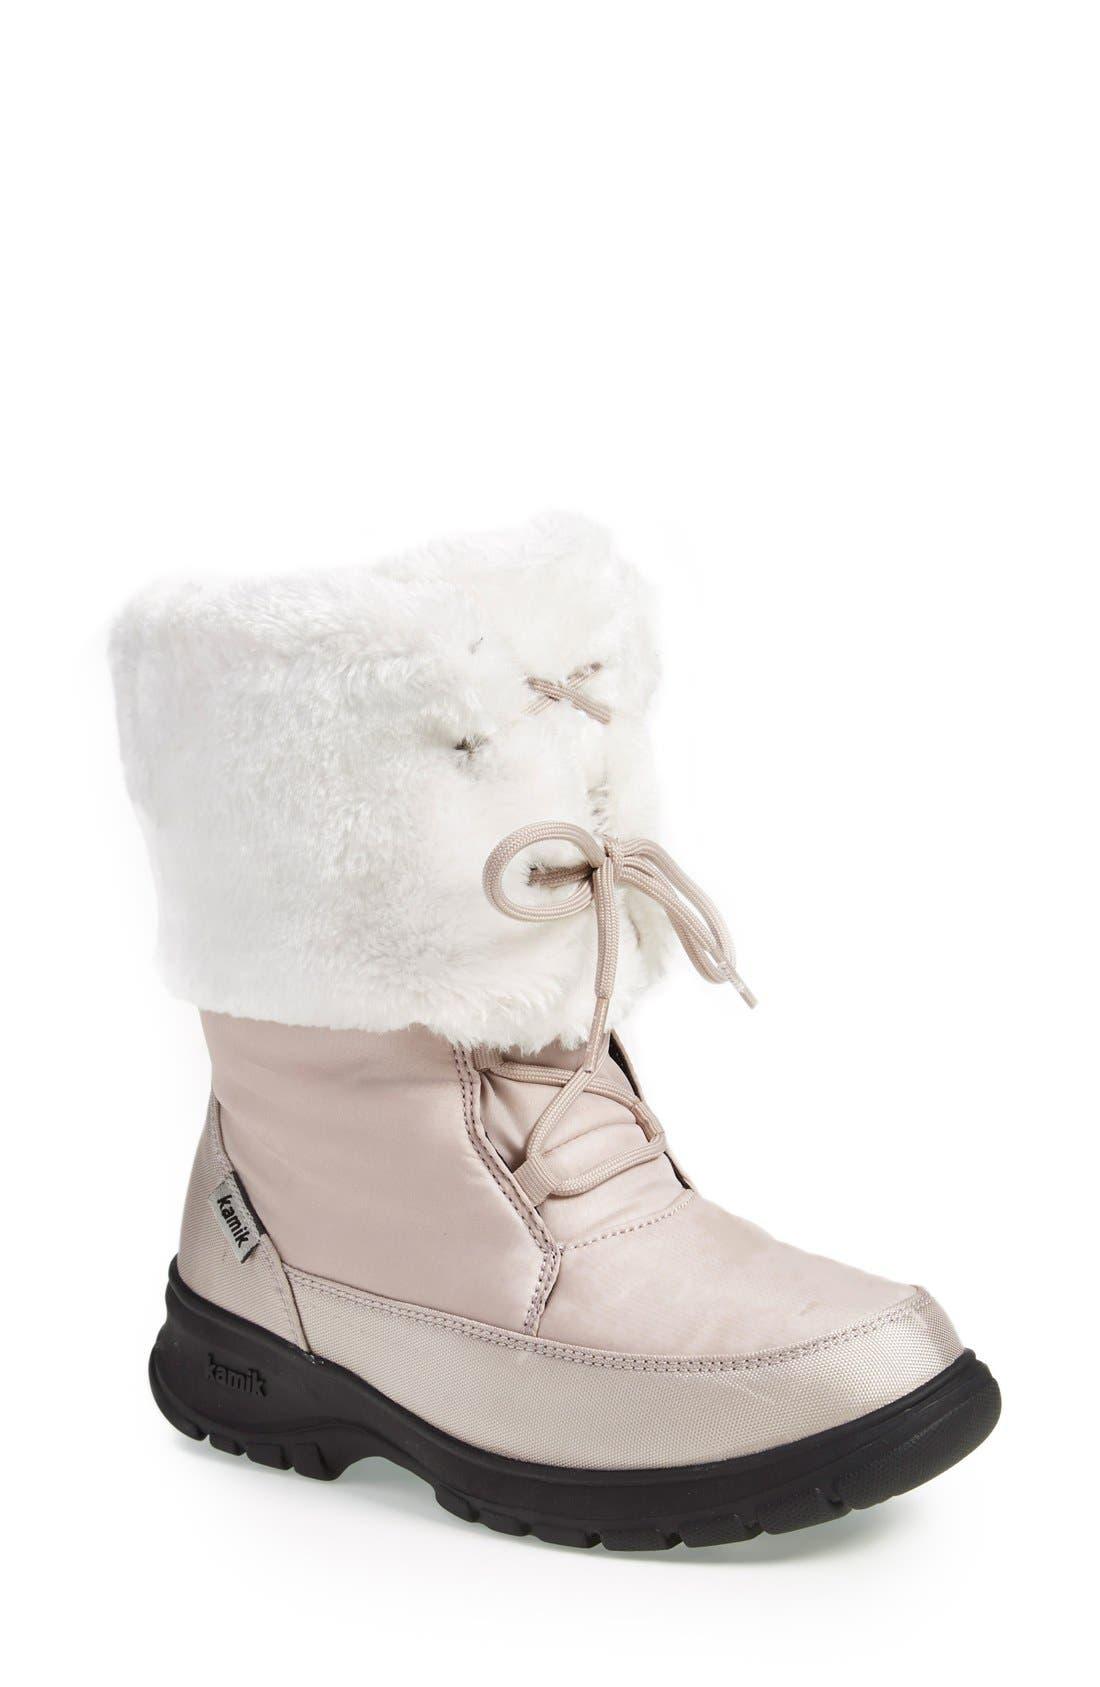 Alternate Image 1 Selected - Kamik 'Seattle' Fuzzy Boot (Women)